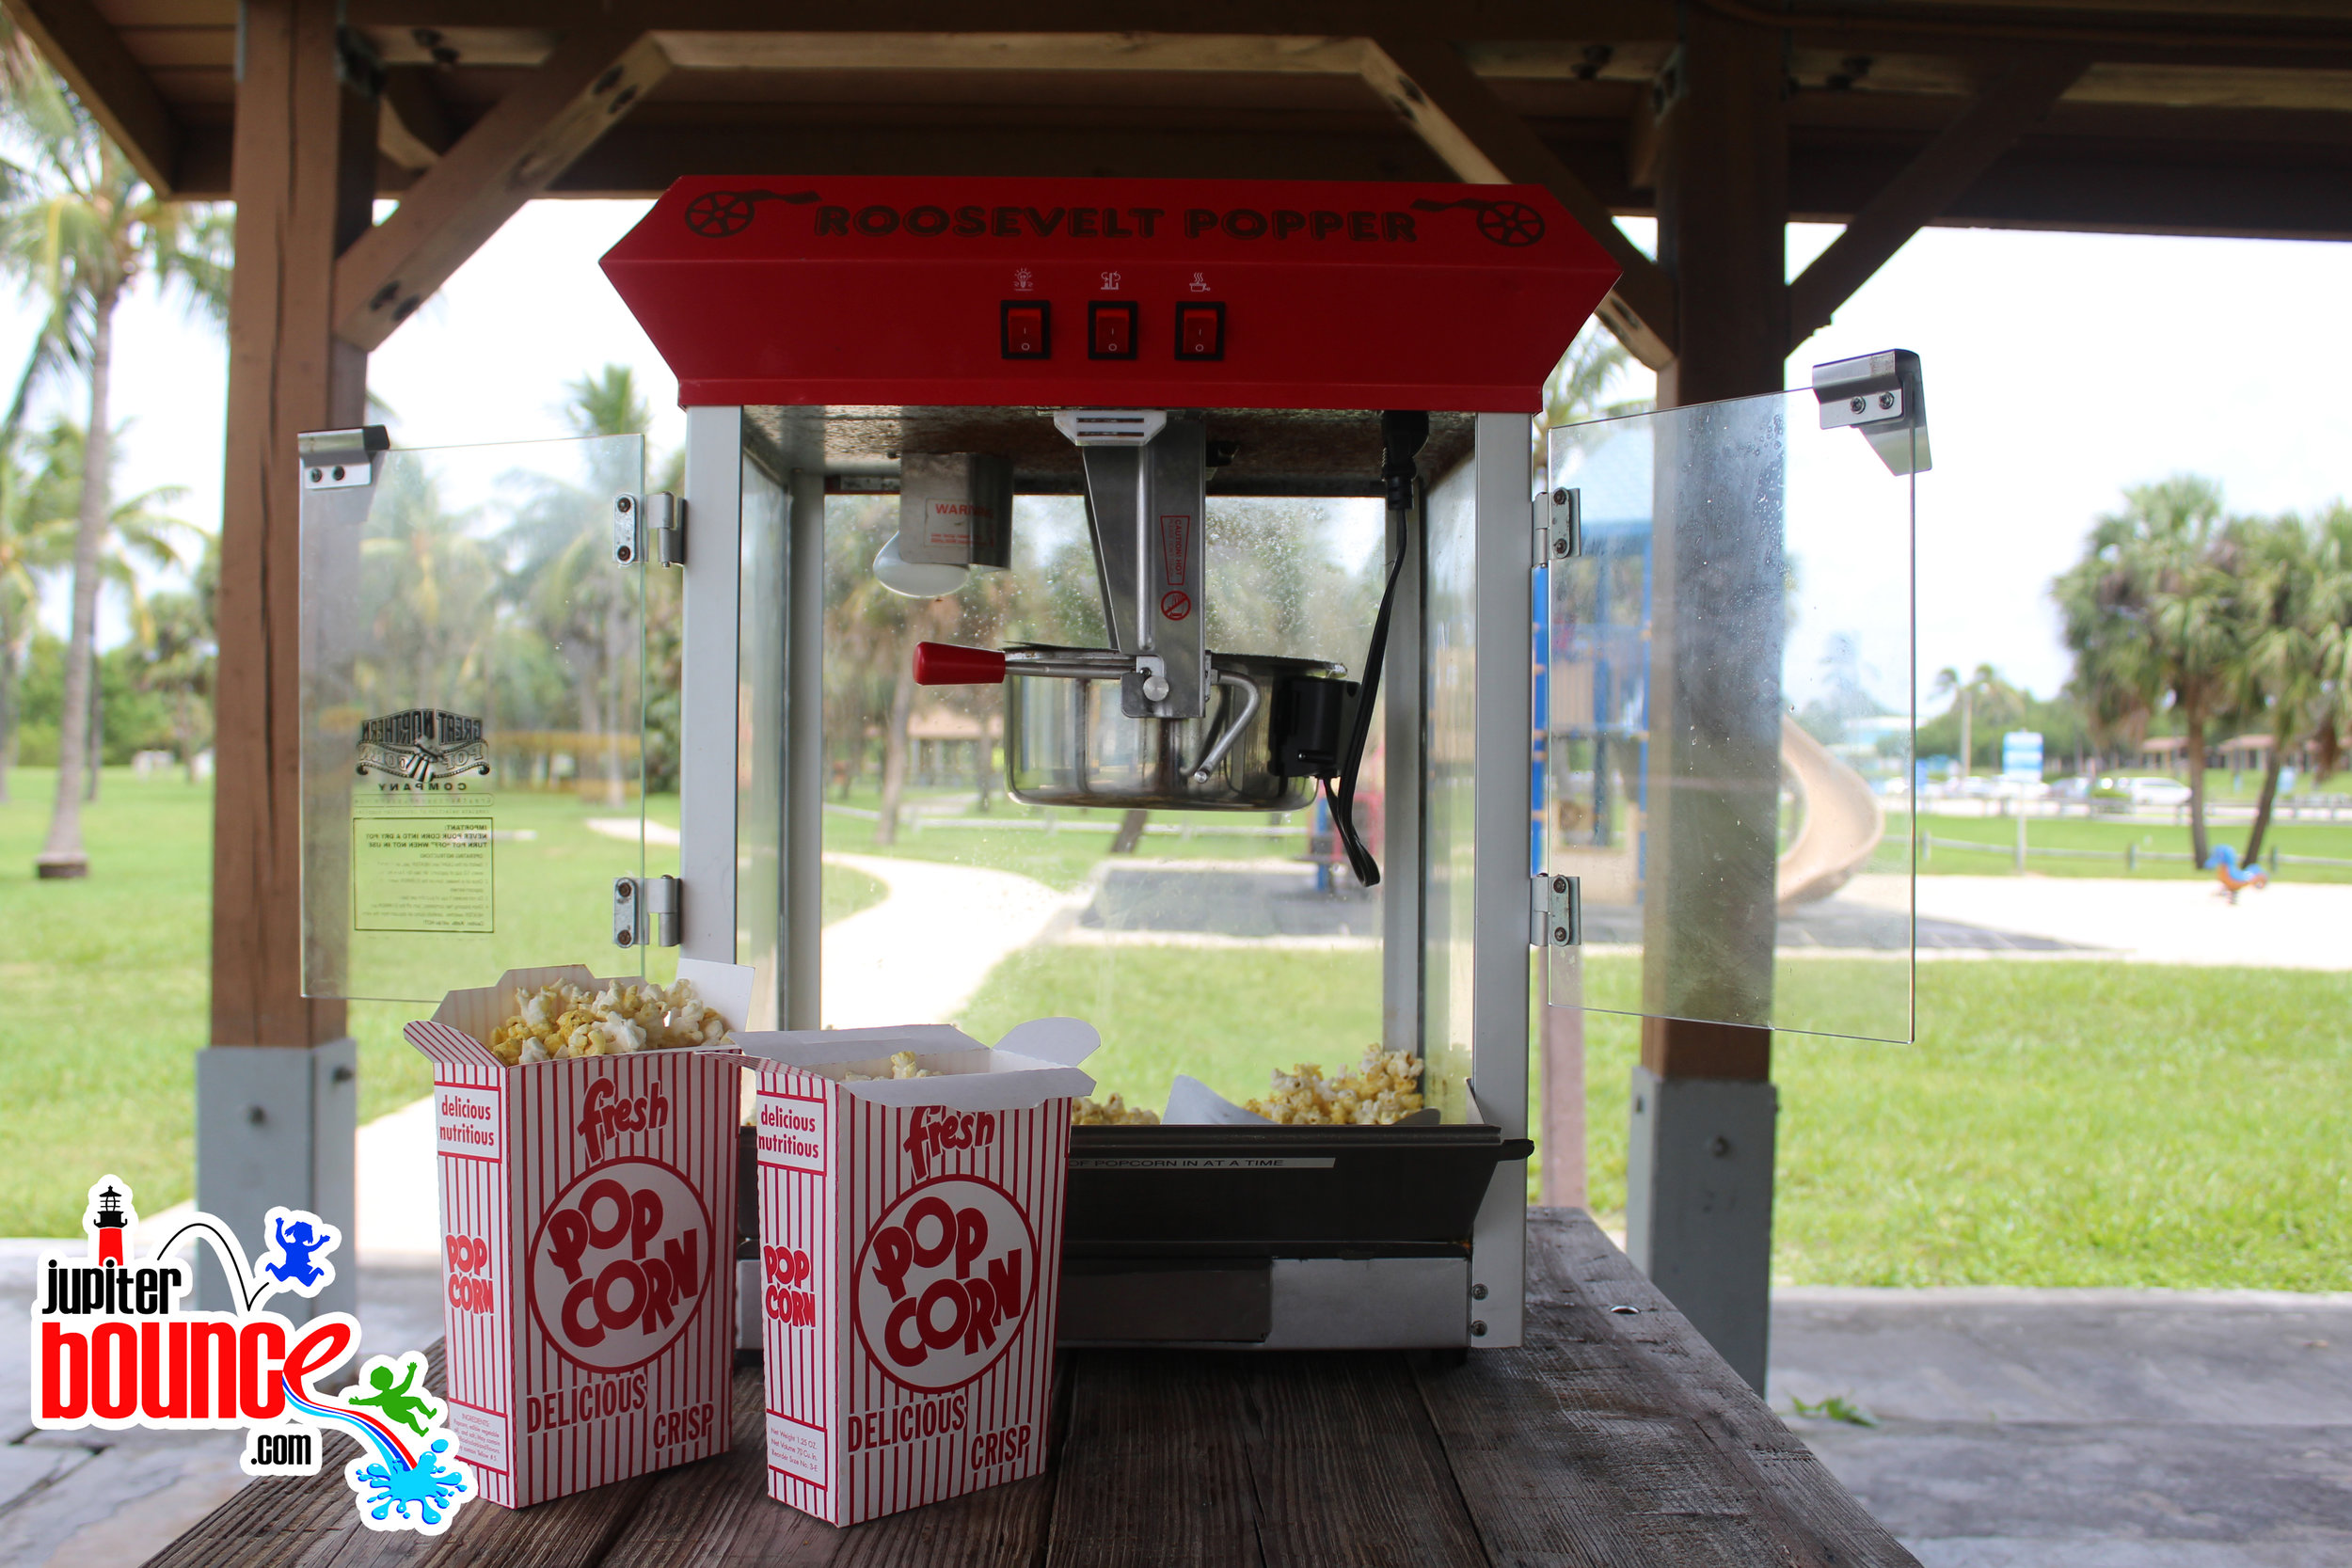 popcornmachine-jupiterbounce-wellington-westpalmbeach-gardensmall-okeechobee-lantana-foodmachinerentals-indiantownroad-waterslides-sportsgames.jpg